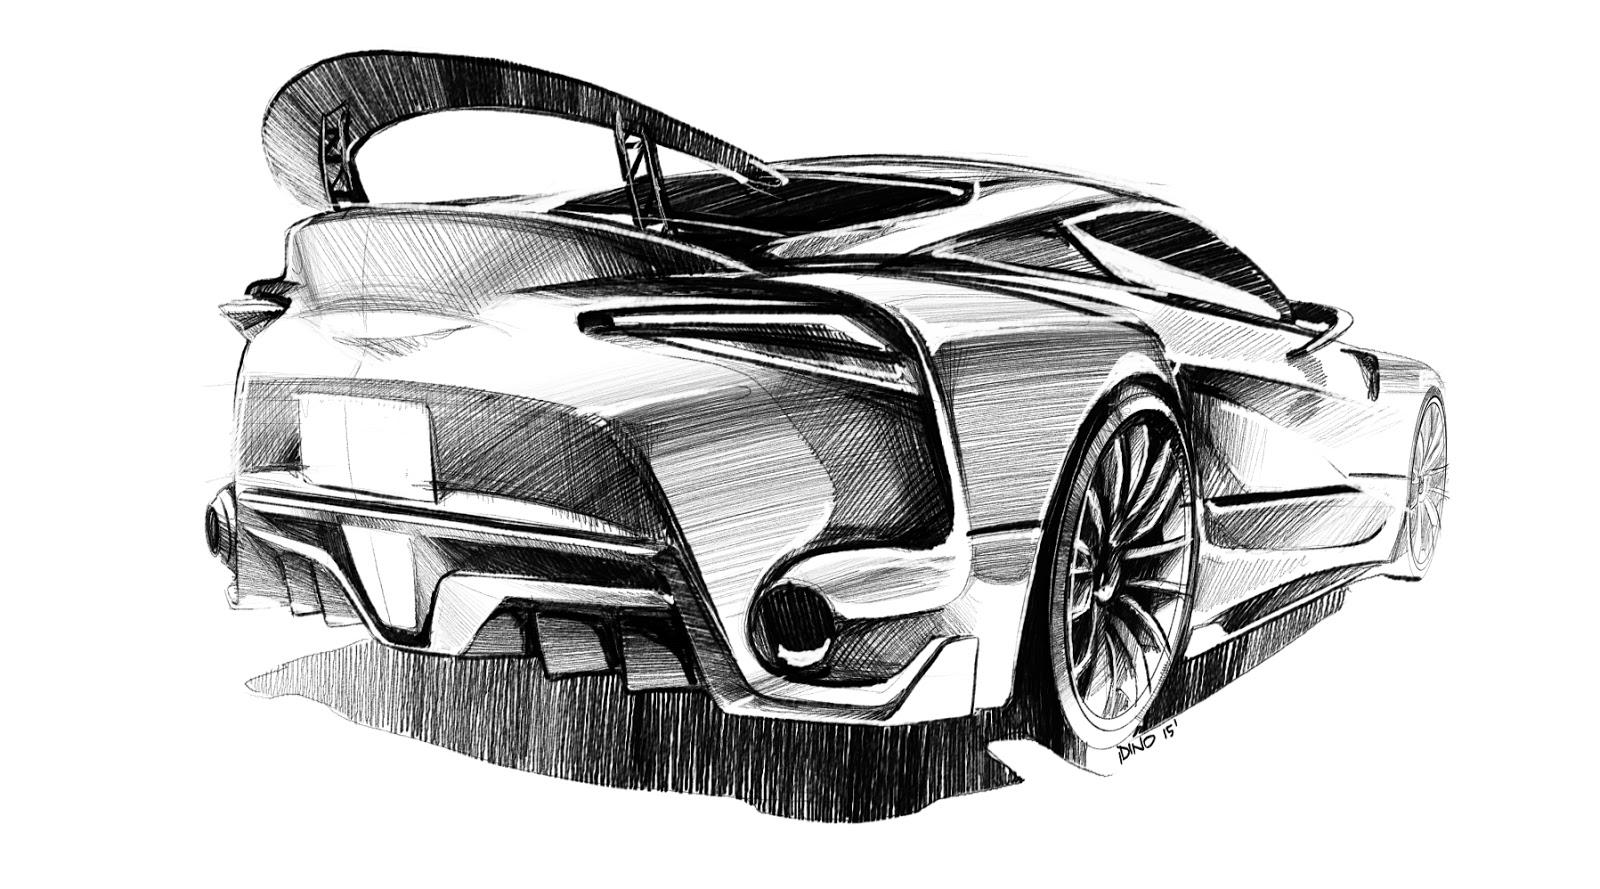 Car Design Blog